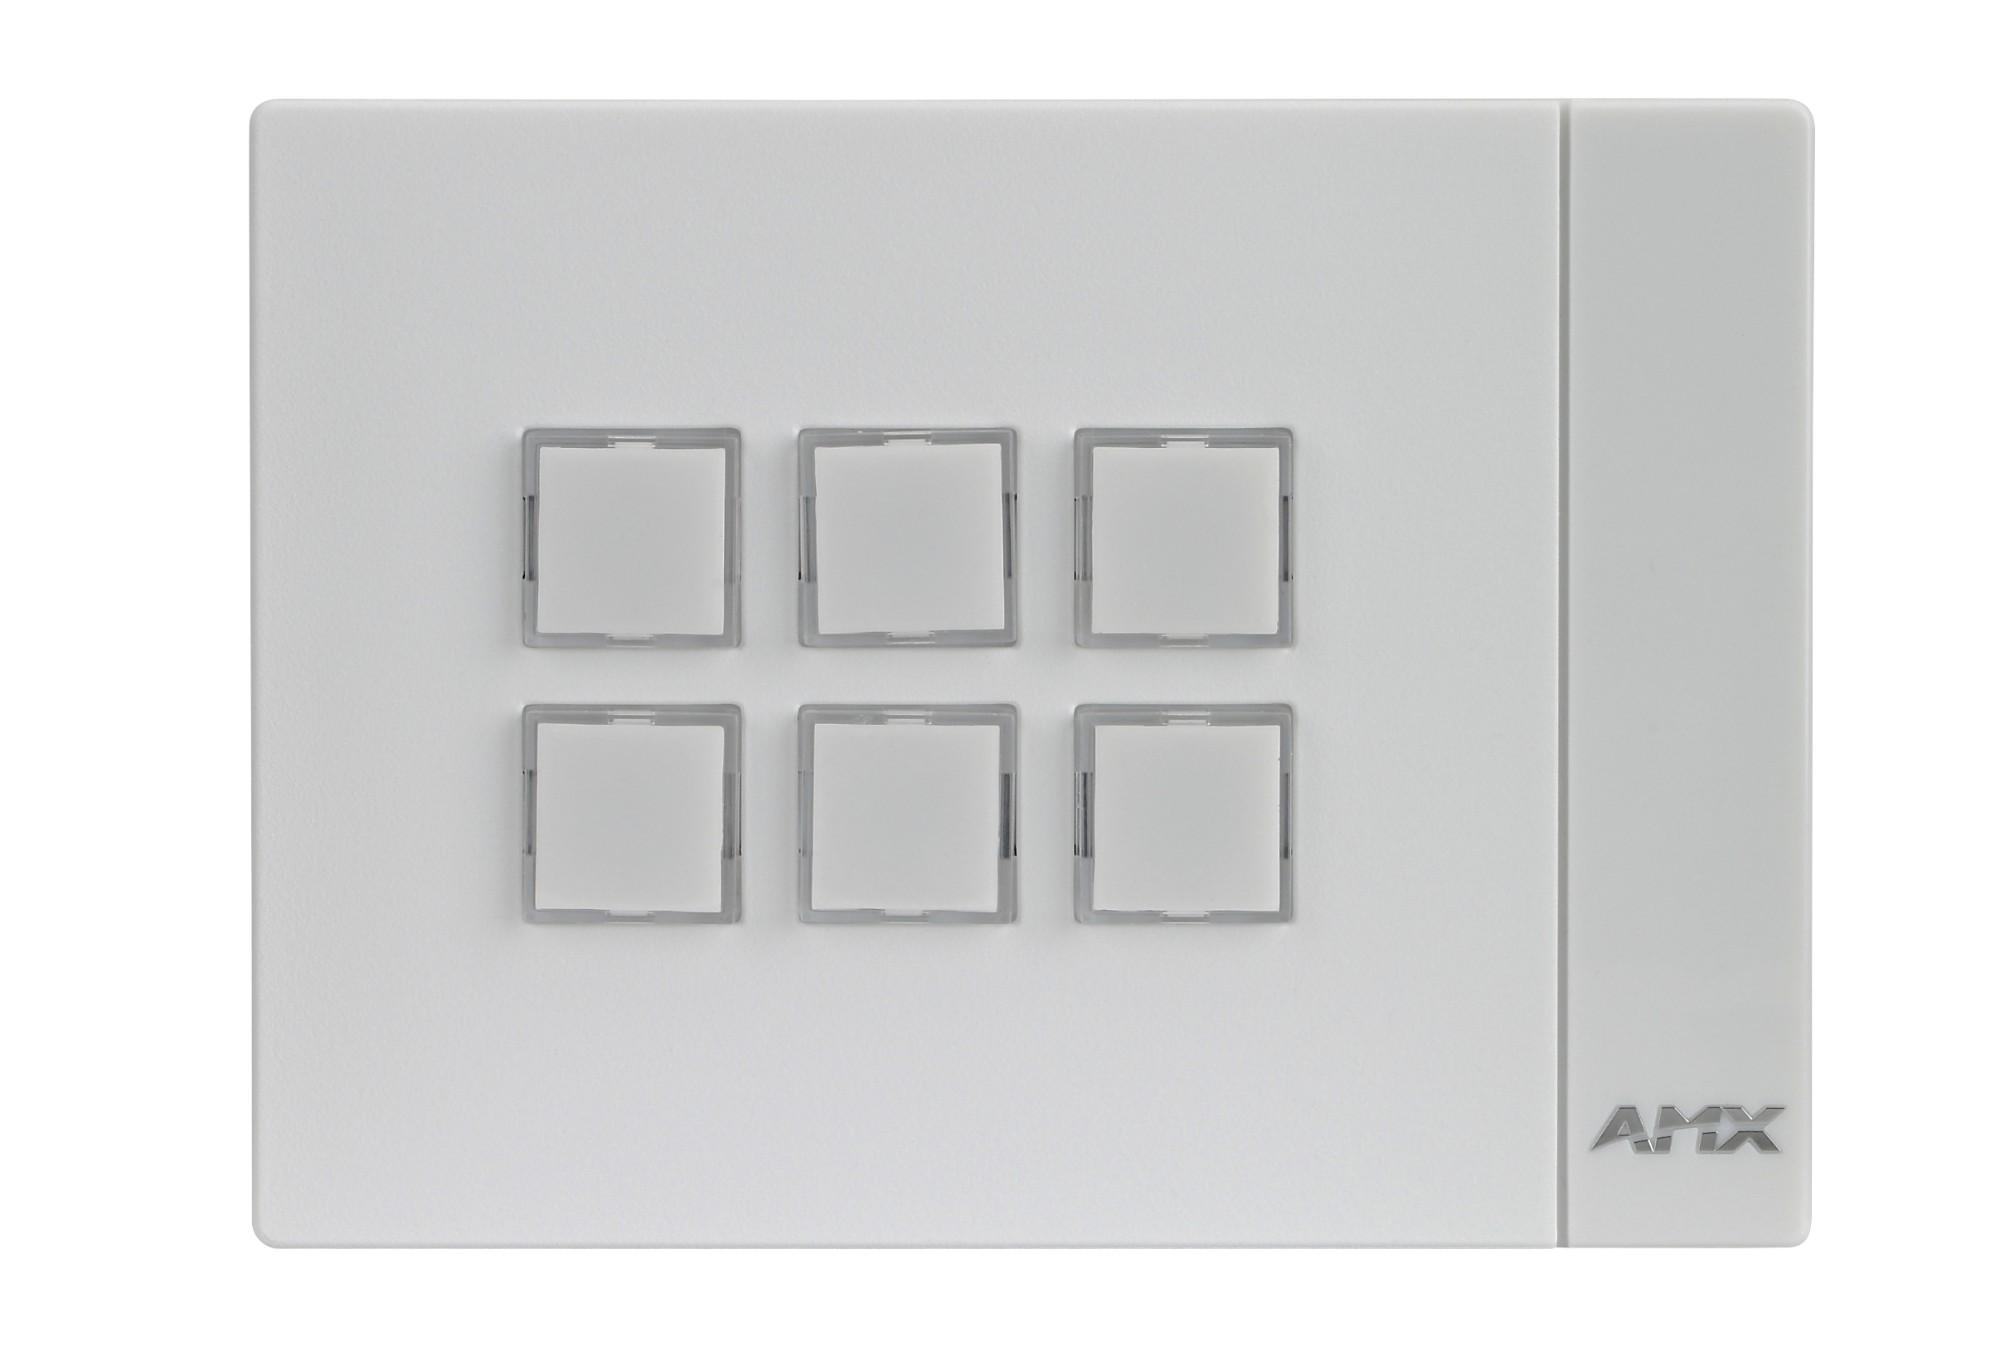 AMX MCP-106 White push-button panel